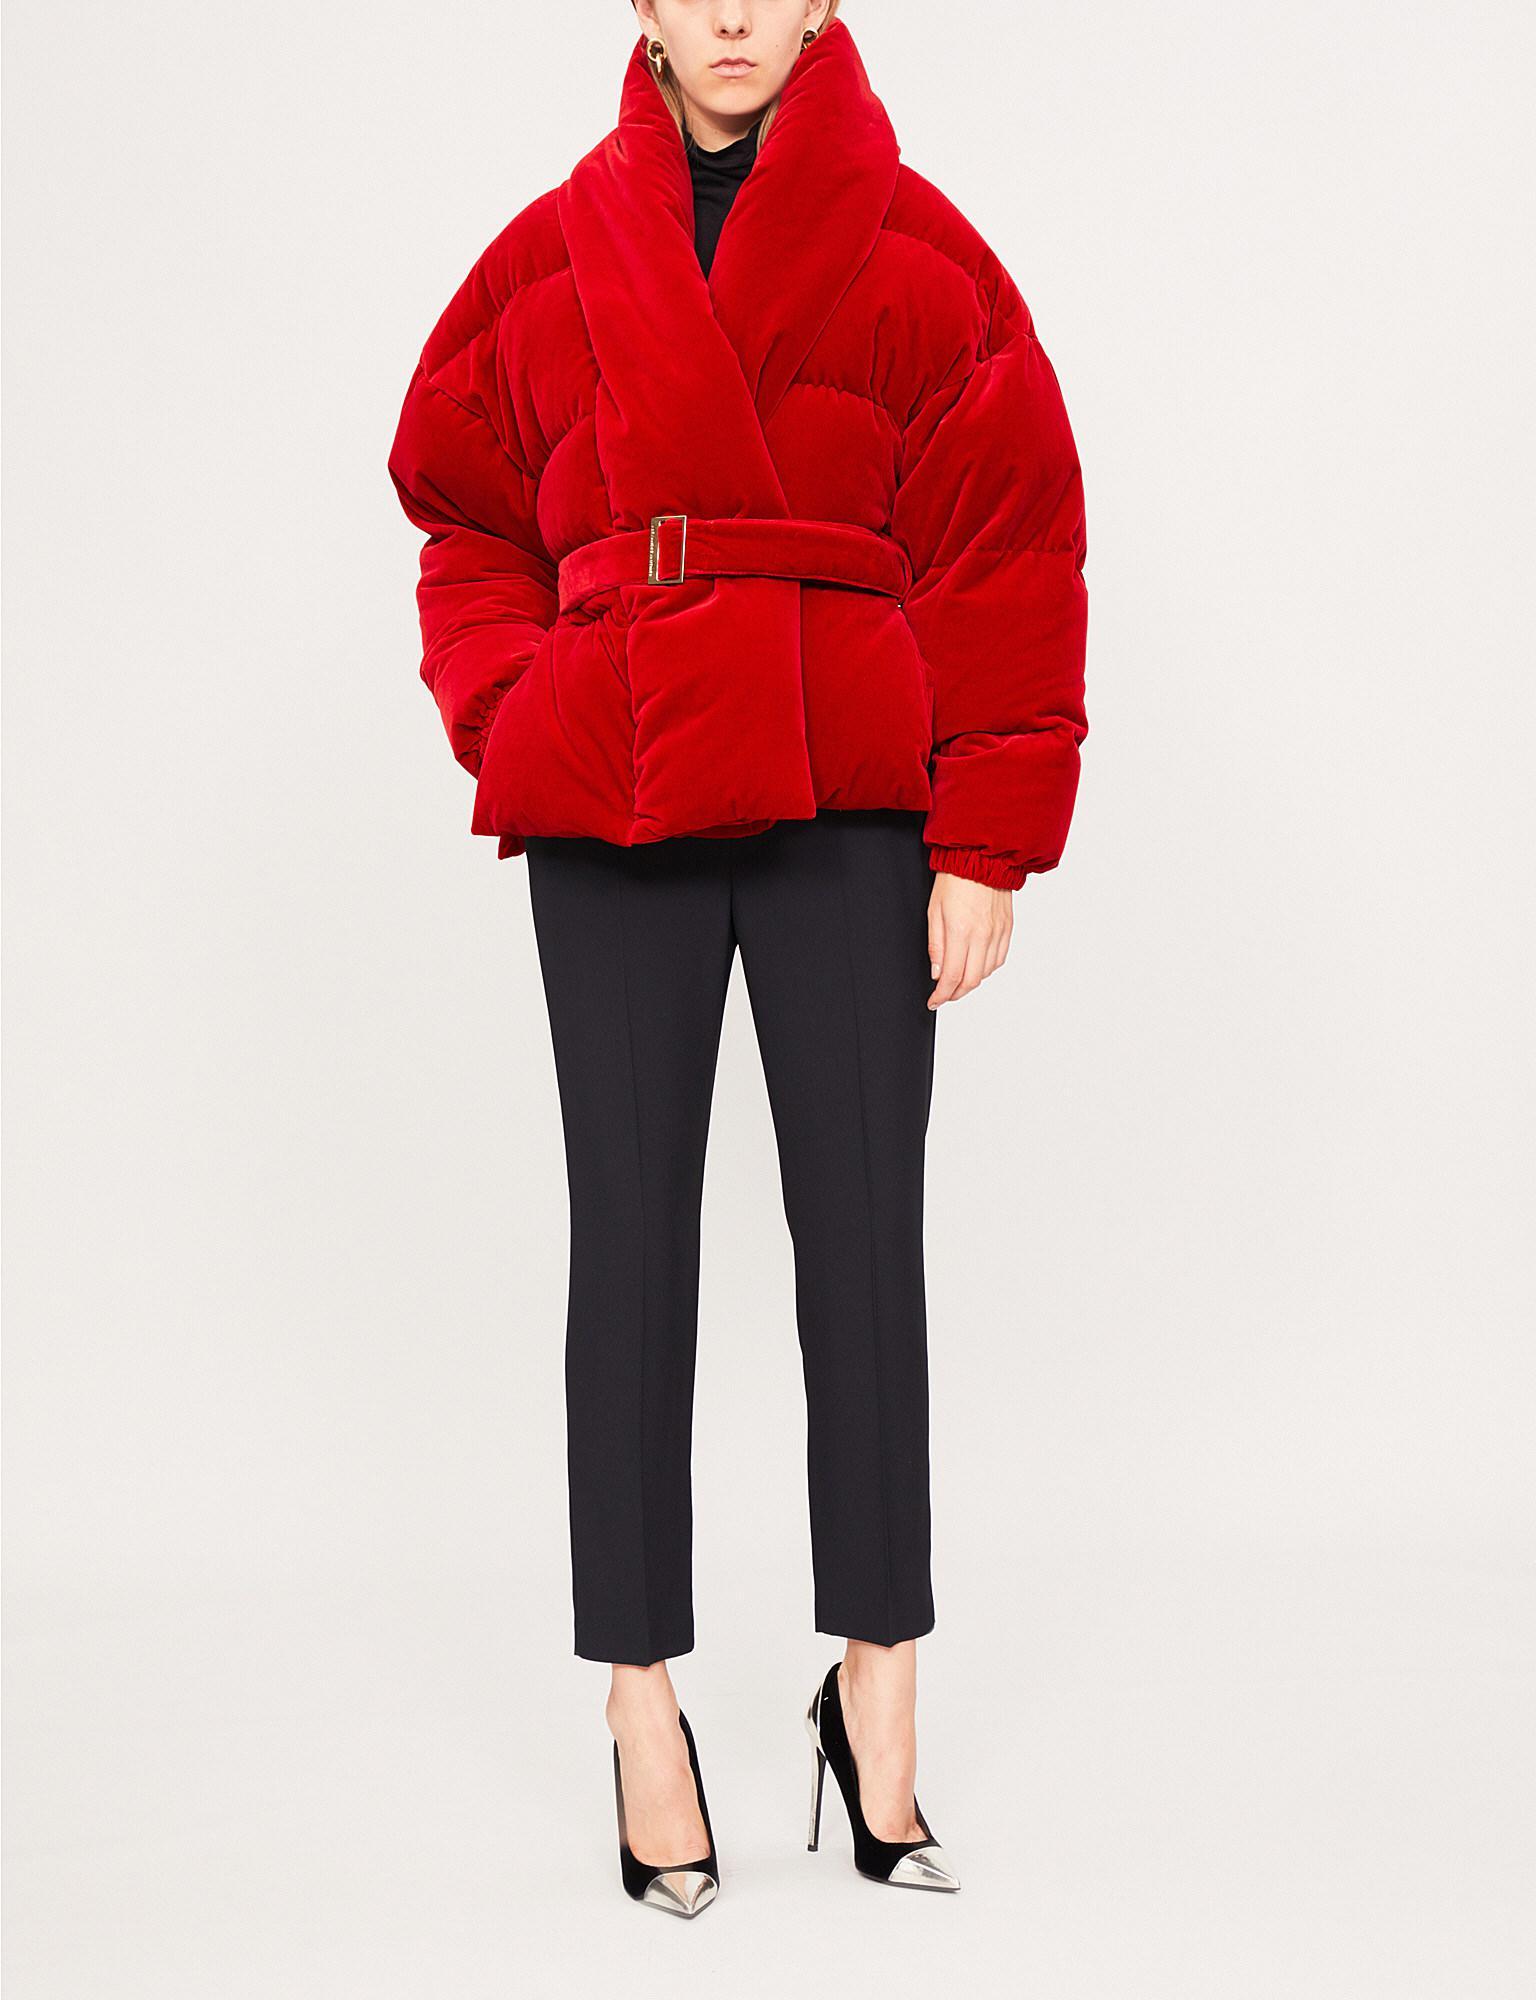 5237a23d Alexandre Vauthier Velvet-down Puffer Jacket in Red - Lyst